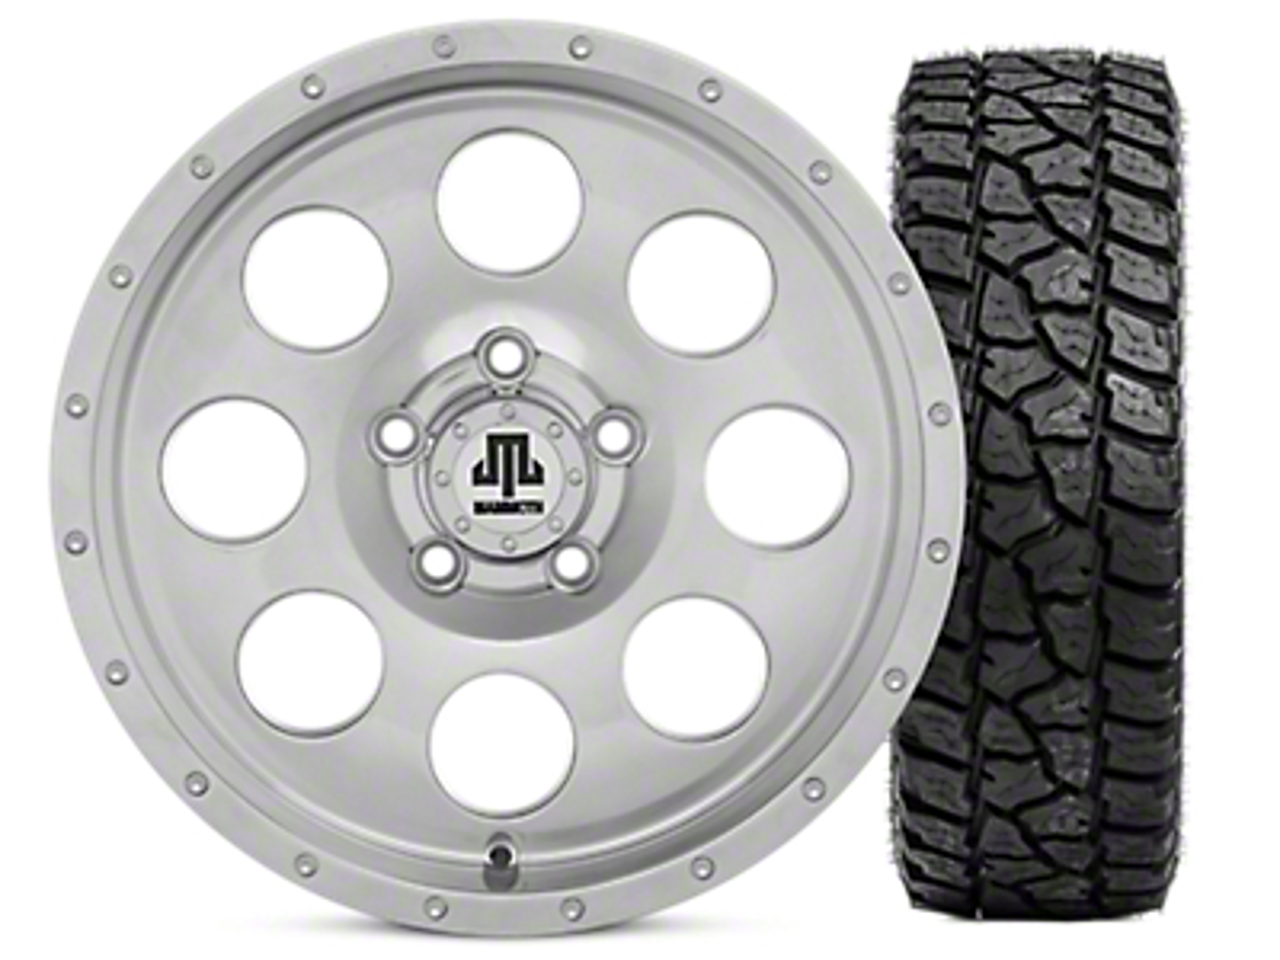 Mammoth 8 Beadlock Style Polished 15x8 Wheel & Mickey Thompson Baja ATZP3 33X12.50R15LT Tire Kit (87-06 Jeep Wrangler YJ & TJ)